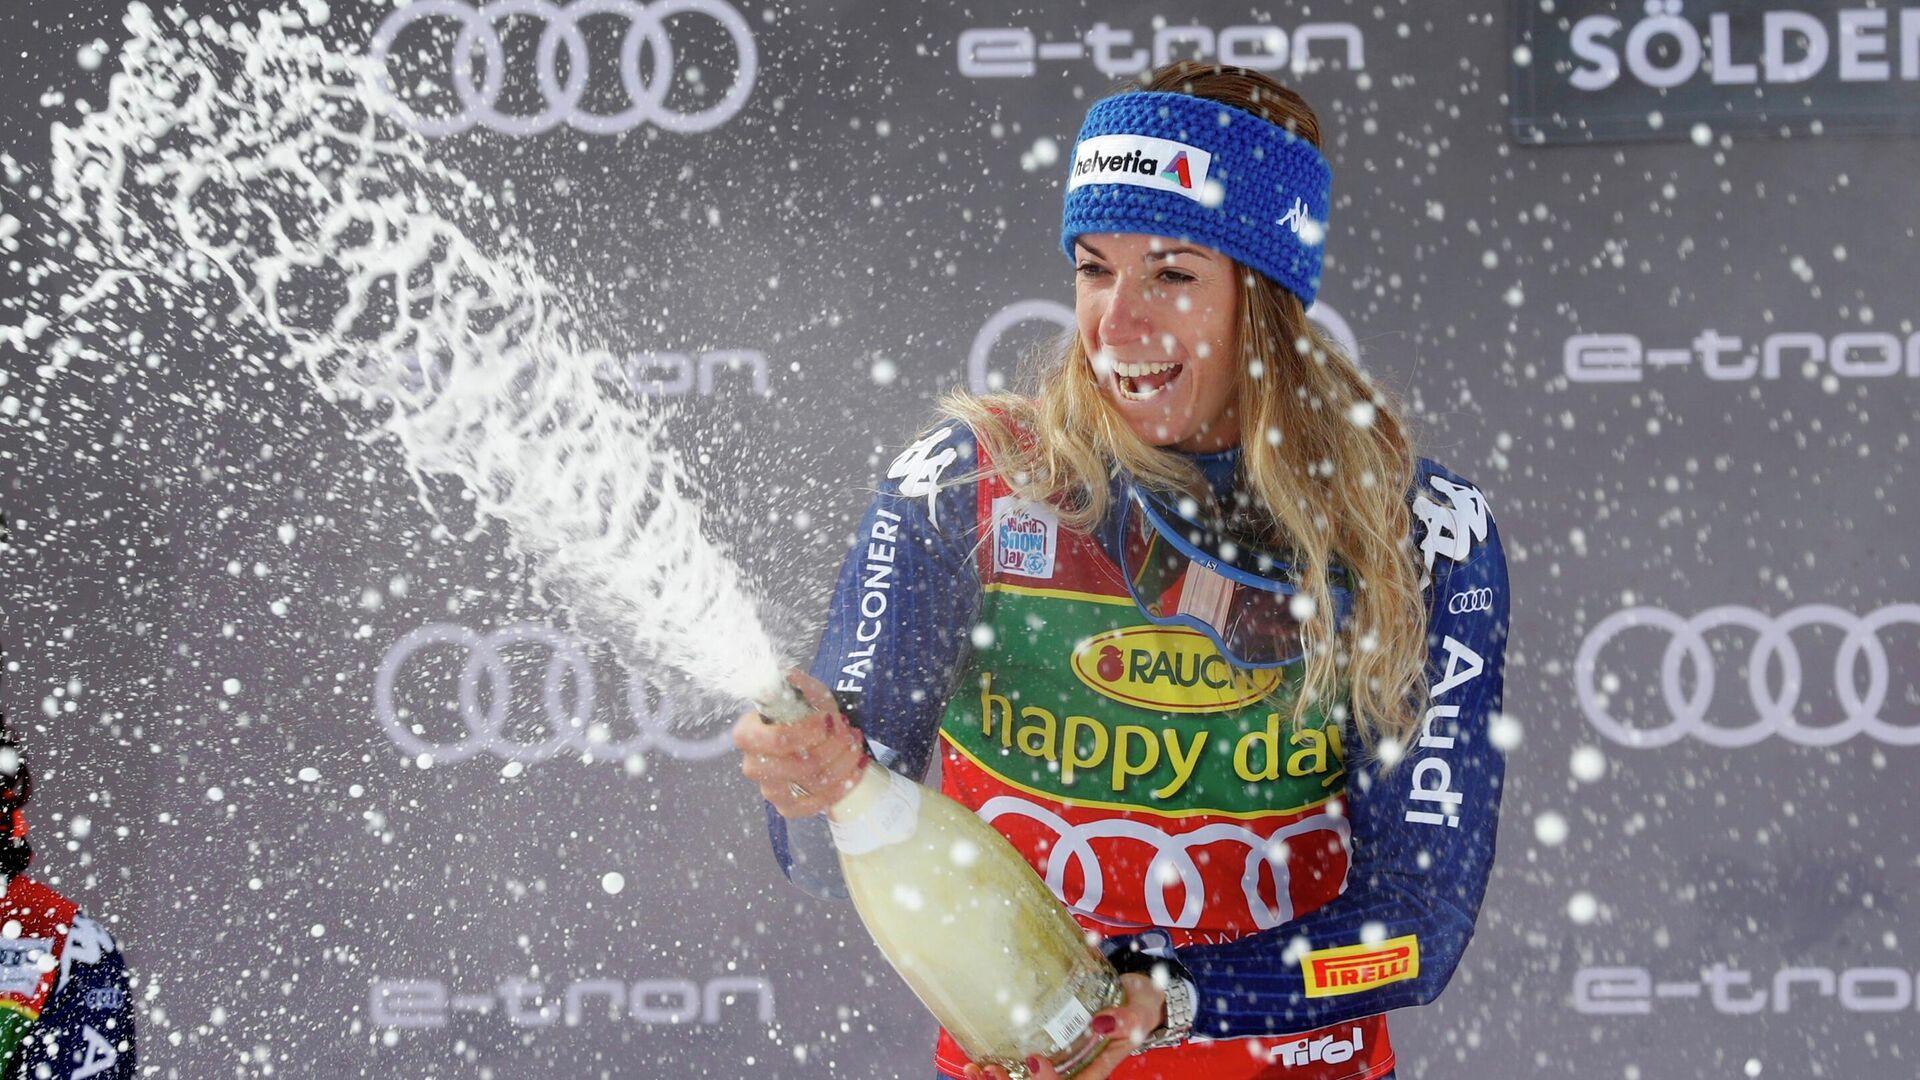 Alpine Skiing - FIS Ski World Cup - Soelden - Women's Giant Slalom - Soelden, Austria - October 17, 2020 Italy's Marta Bassino celebrates on the podium with sparkling wine after winning the event REUTERS/Leonhard Foeger - РИА Новости, 1920, 17.10.2020